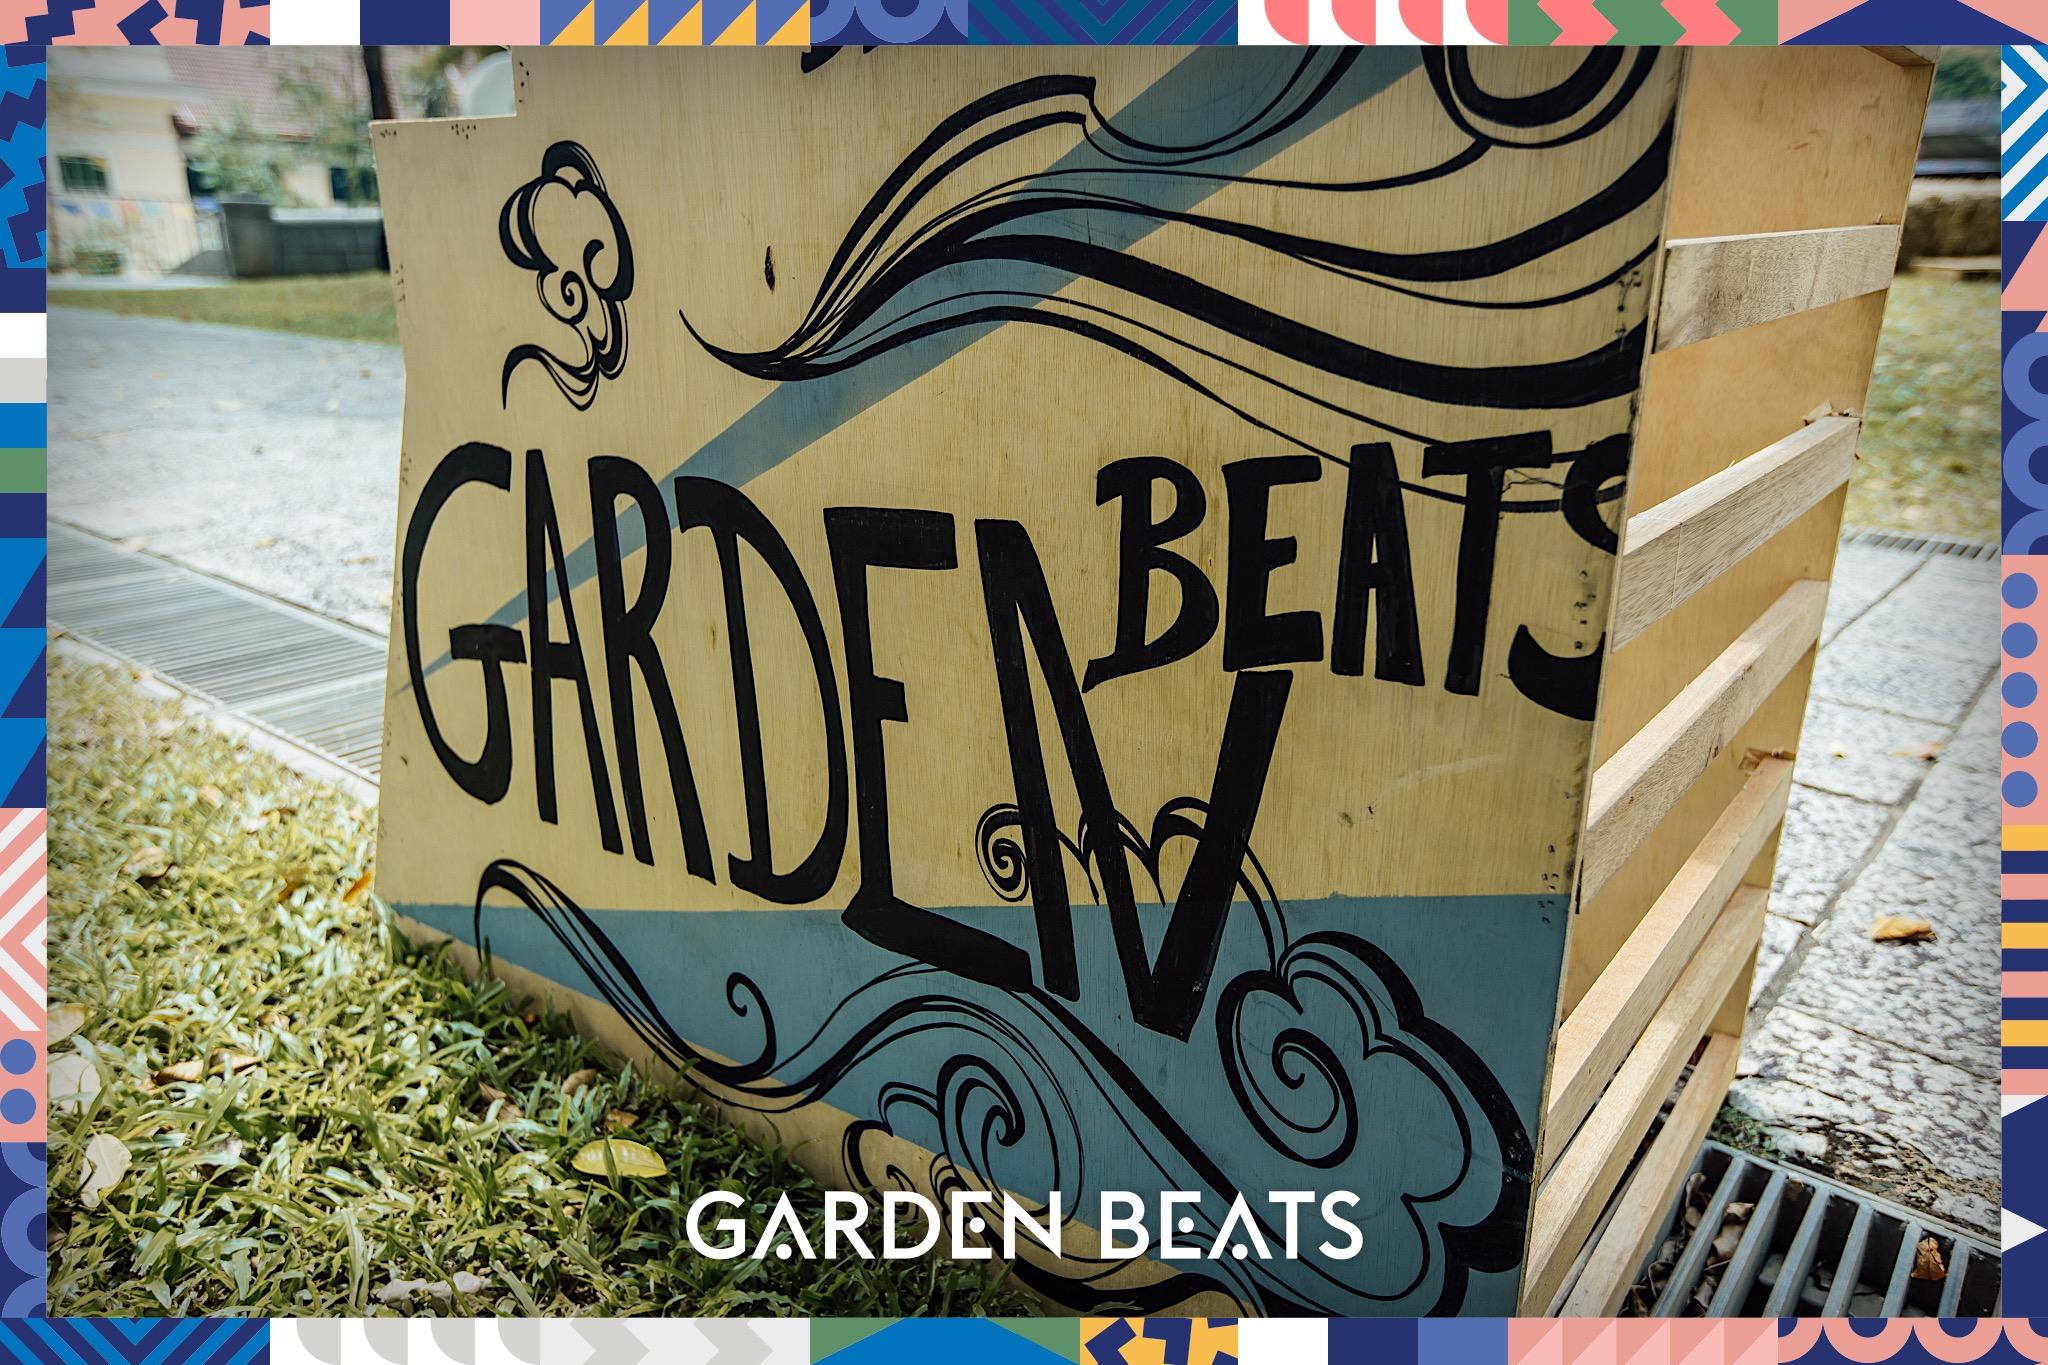 18032017_GardenBeats_Colossal058_WatermarkedGB.jpg